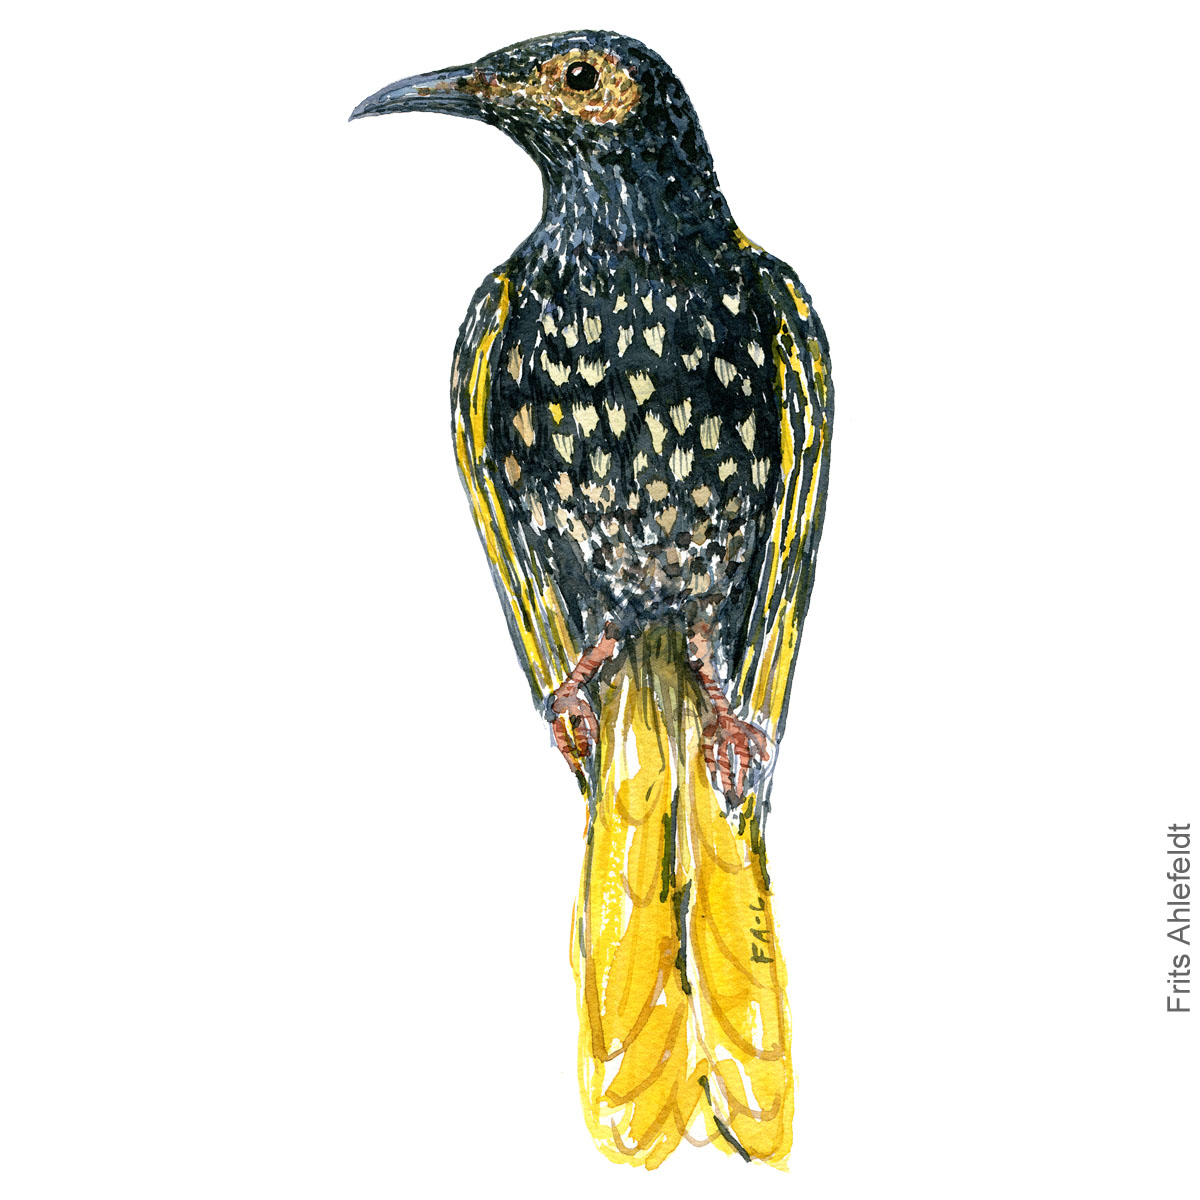 Dw00462 Regent honeyeater watercolor illustration. Painting by Frits Ahlefeldt - Fugle akvarel tegning